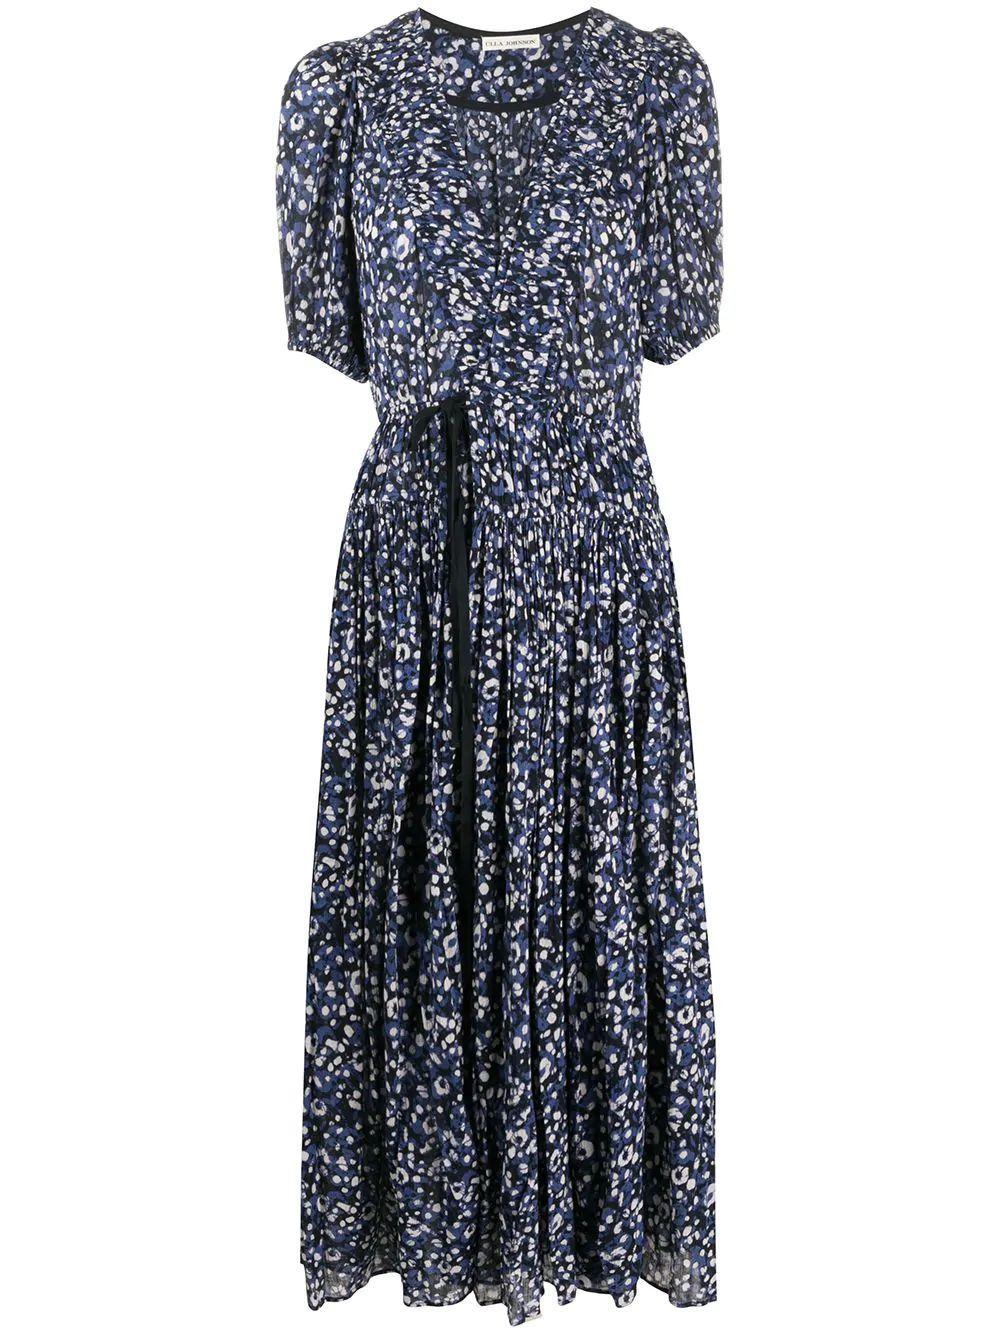 Kemala Printed Long Dress Item # SP200108